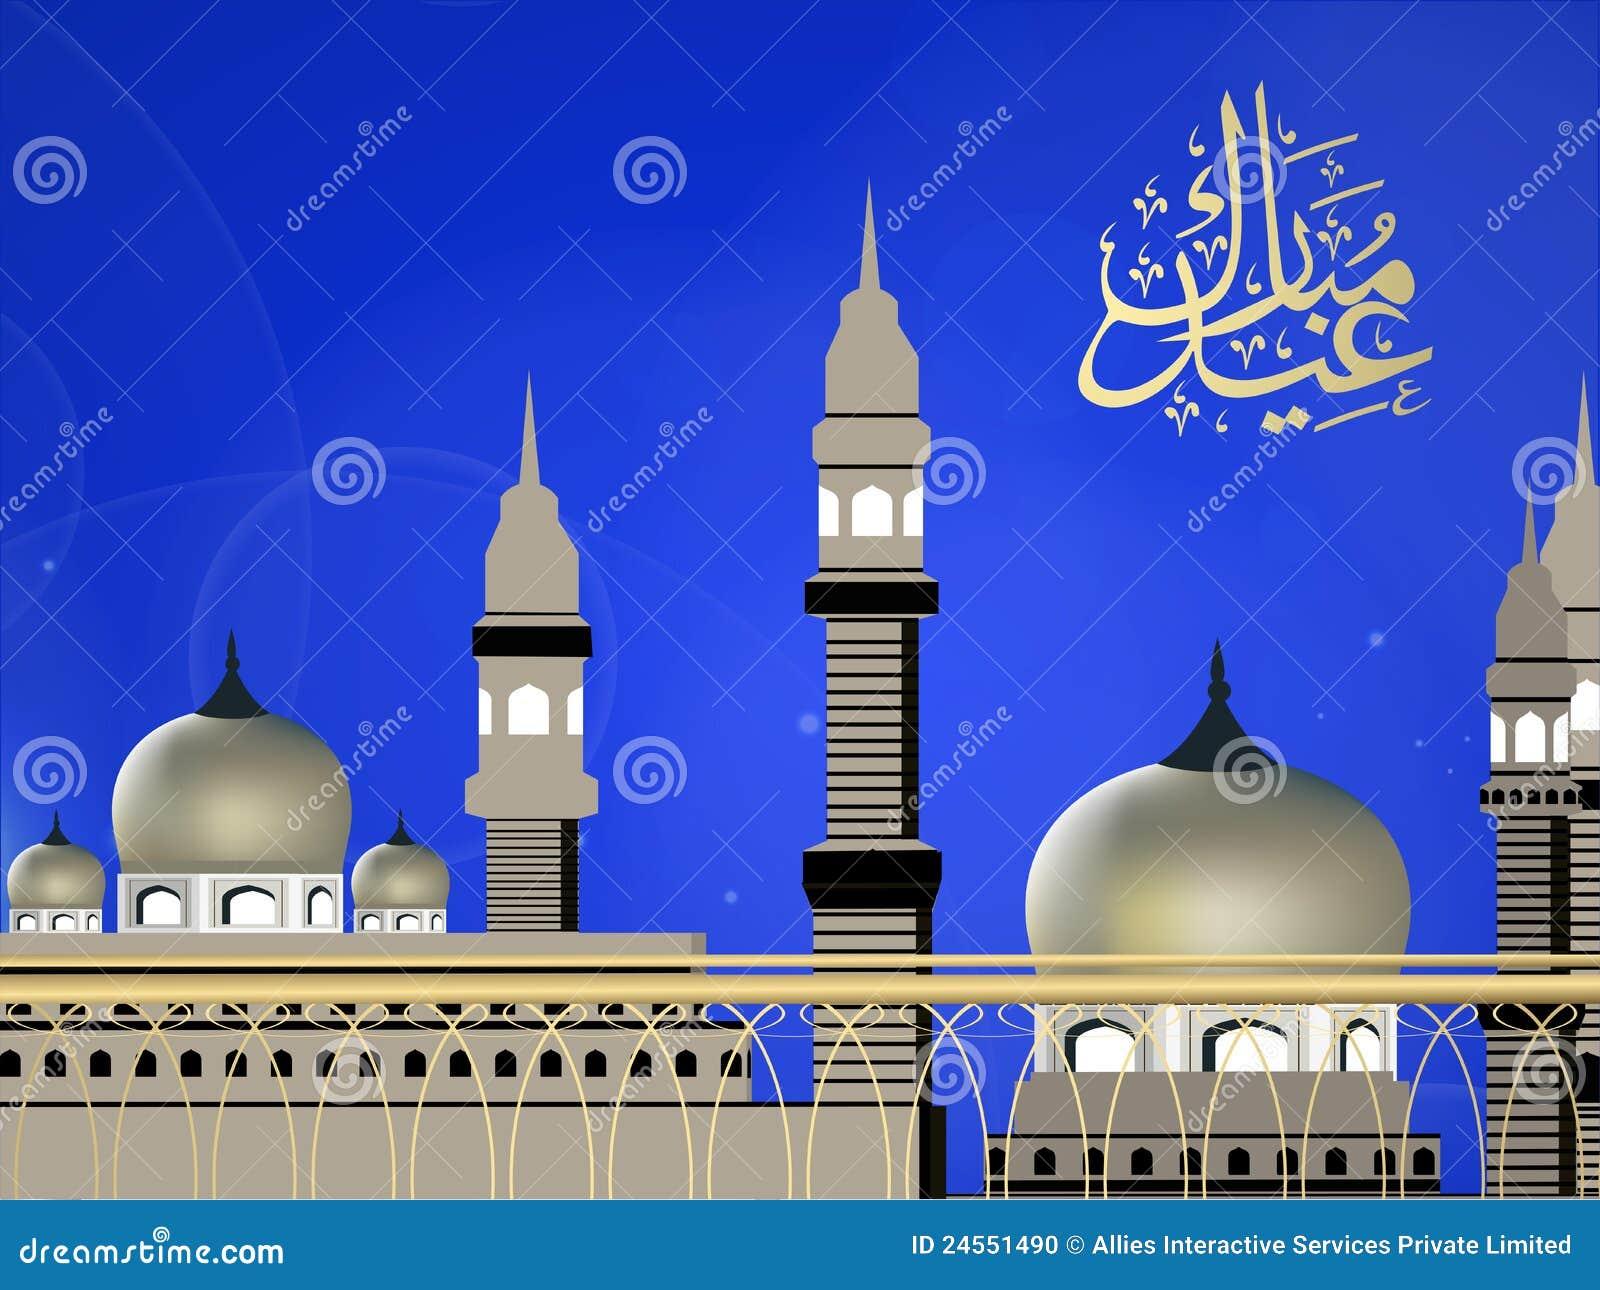 Caligrafia islâmica árabe de Eid Mubarak